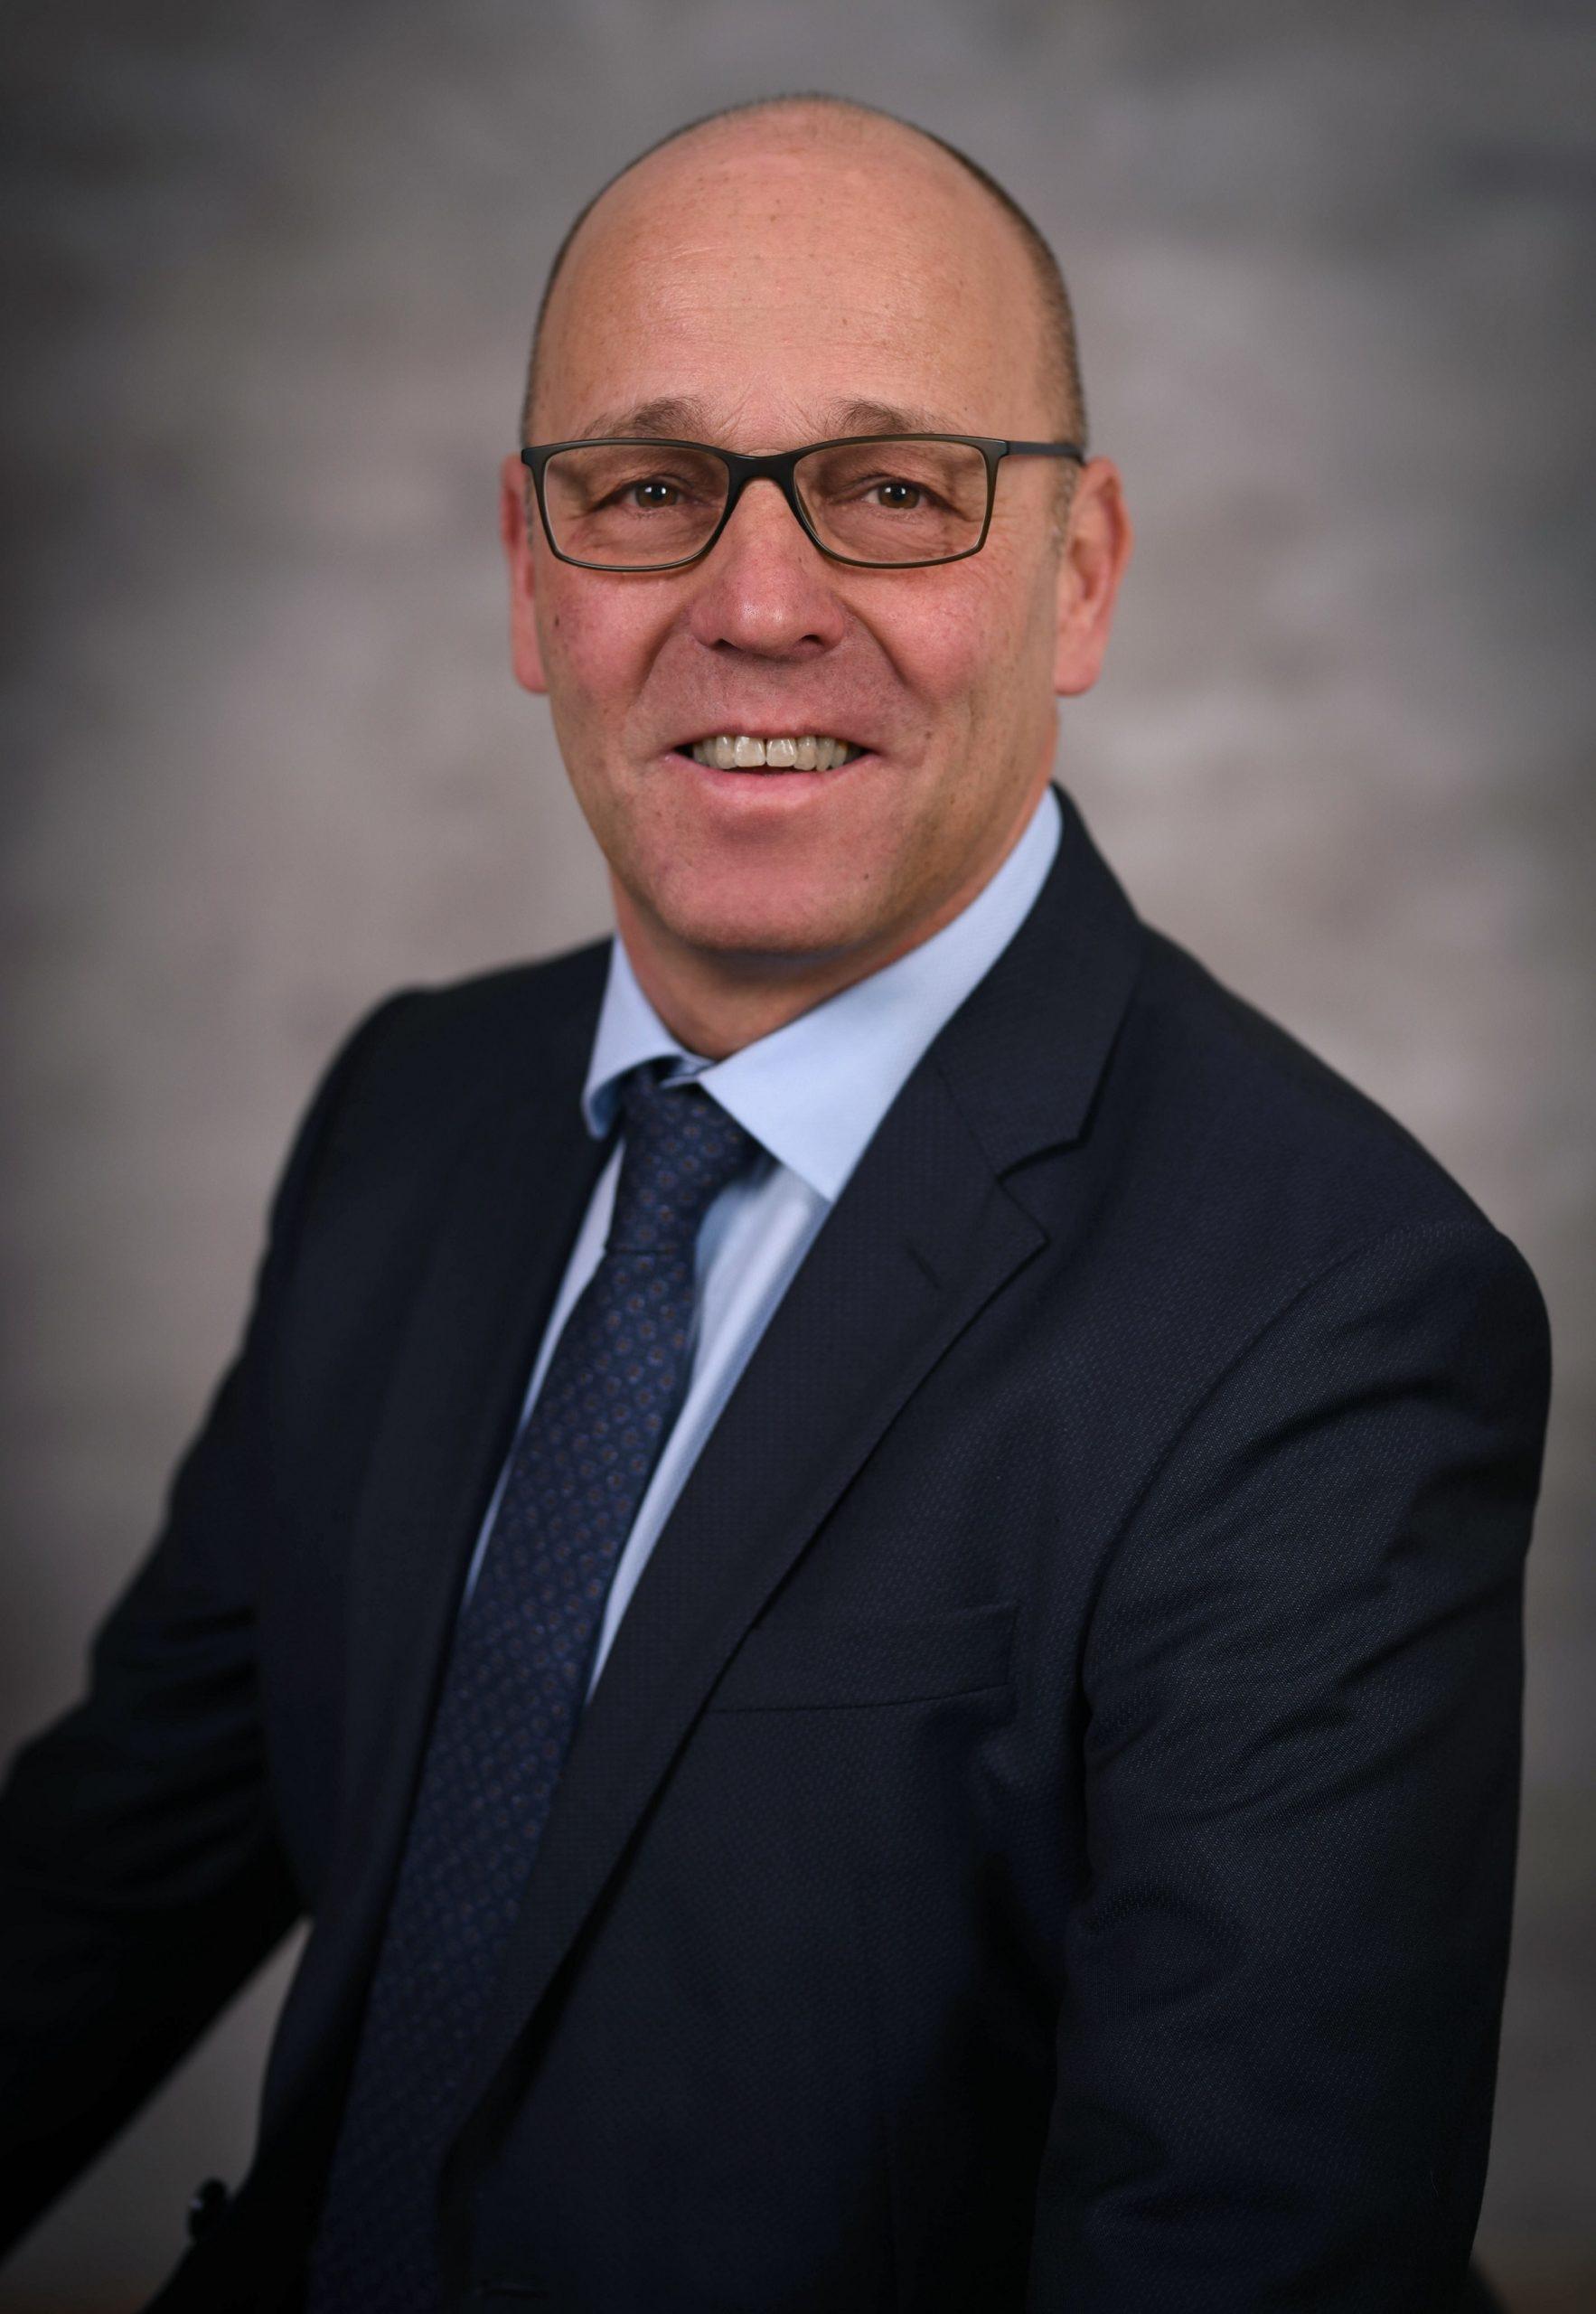 Gerd Kleinhenz